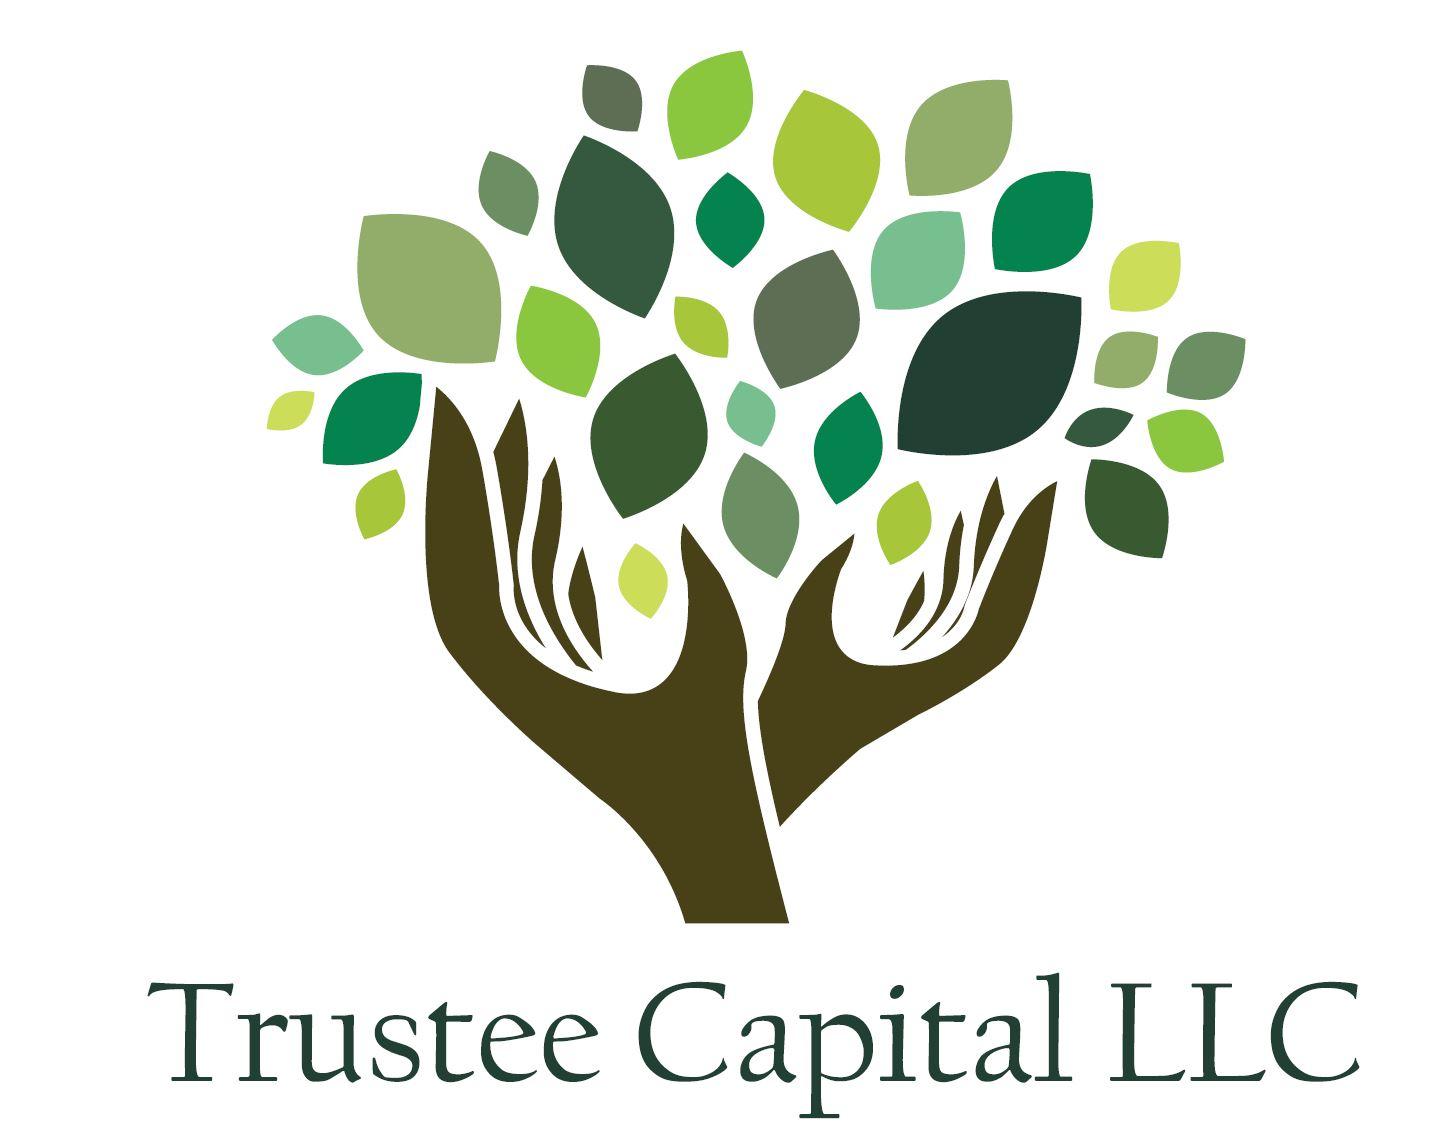 trustee capital llc